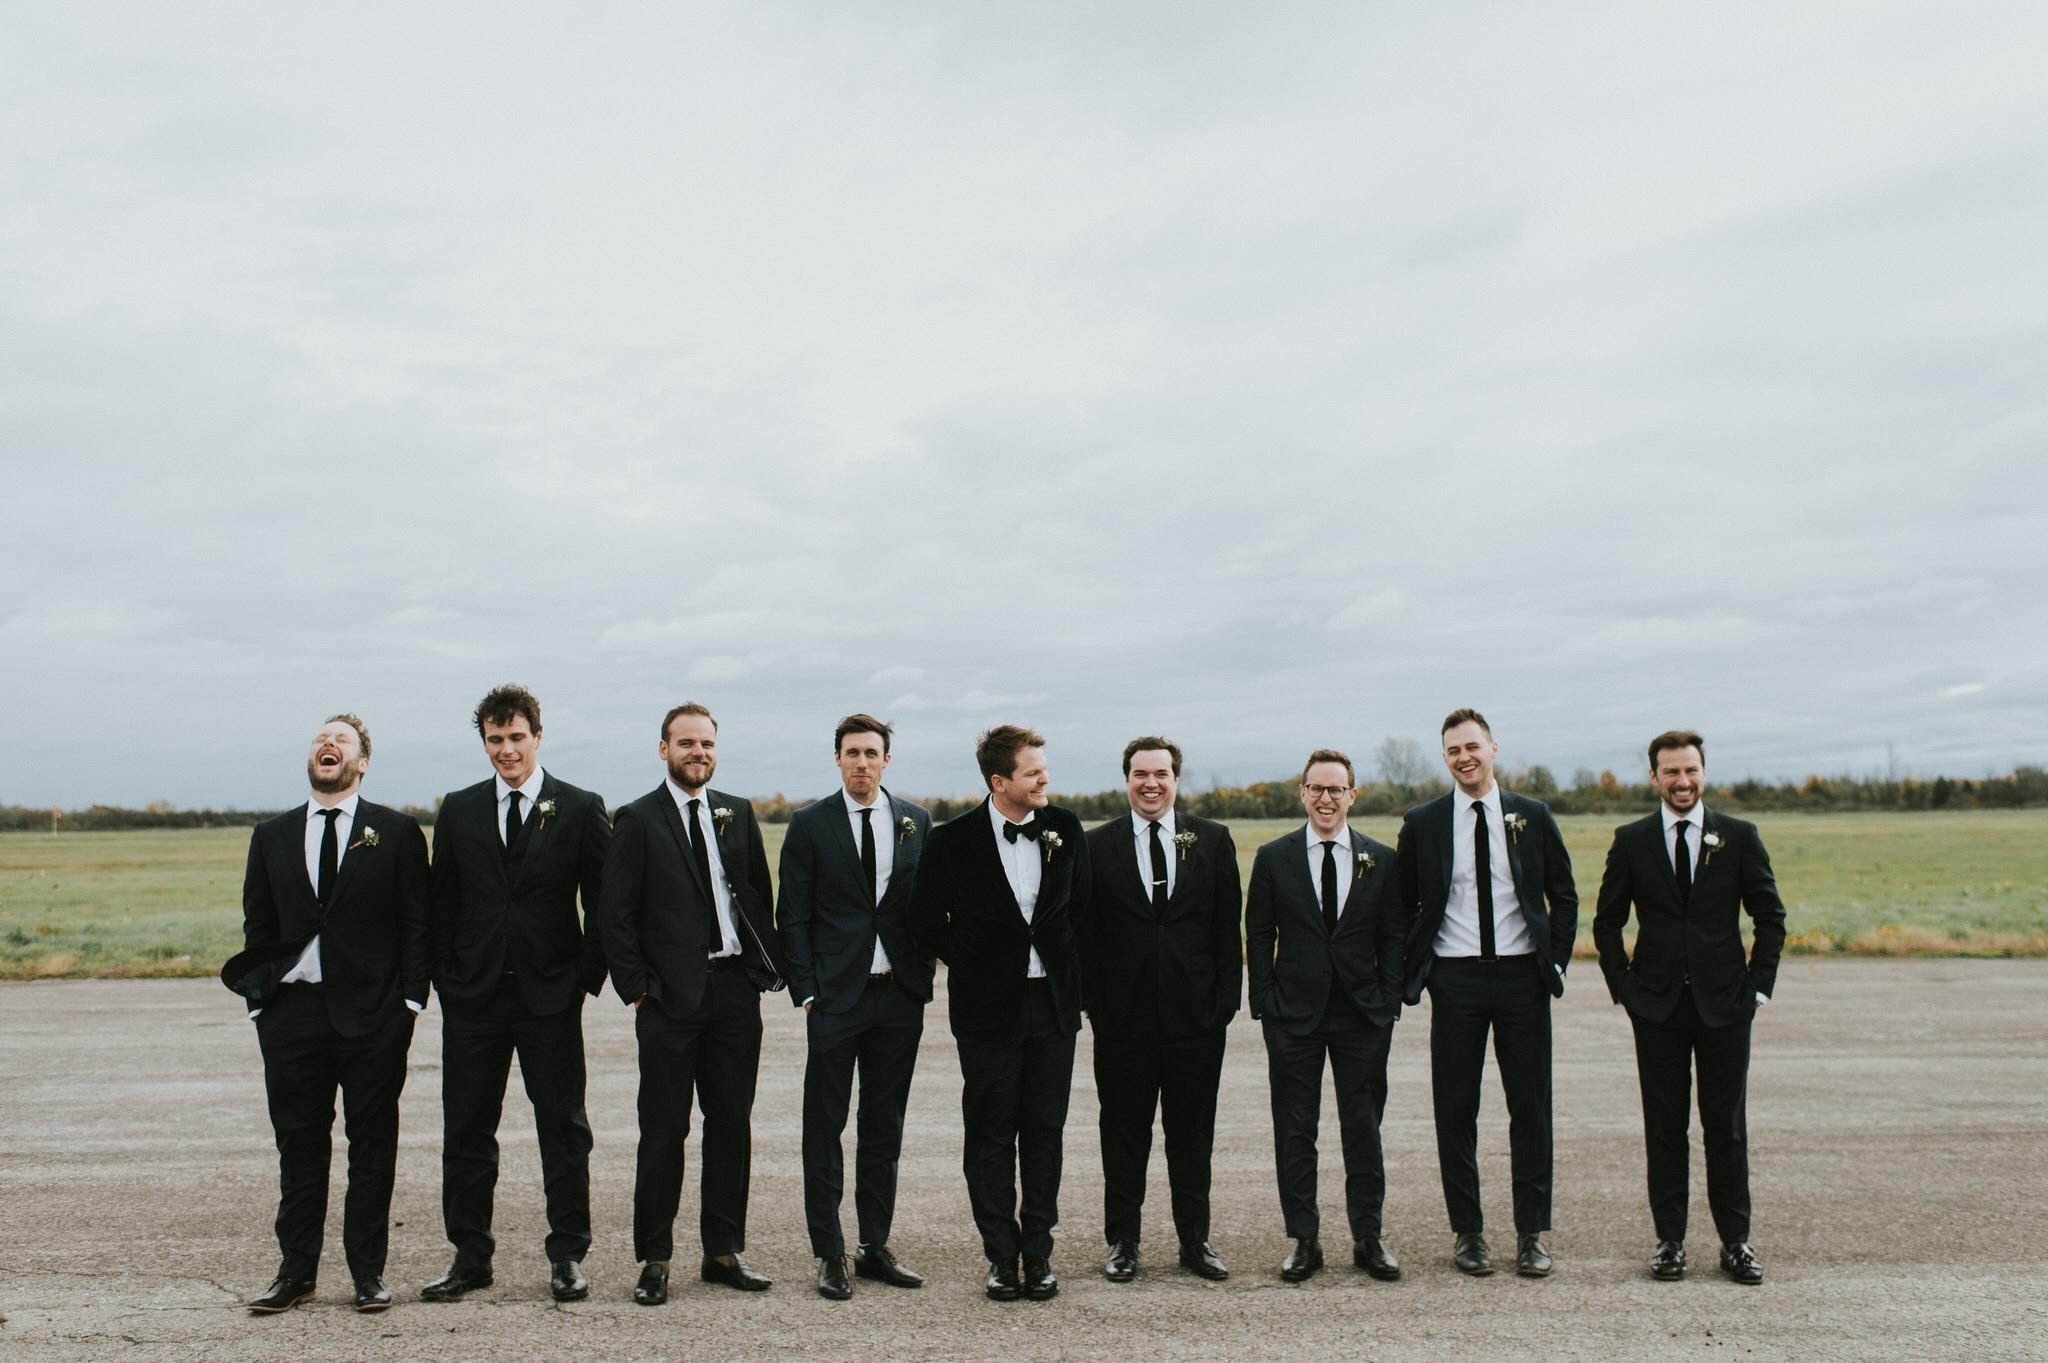 scarletoneillphotography_weddingphotography_prince edward county weddings061.JPG